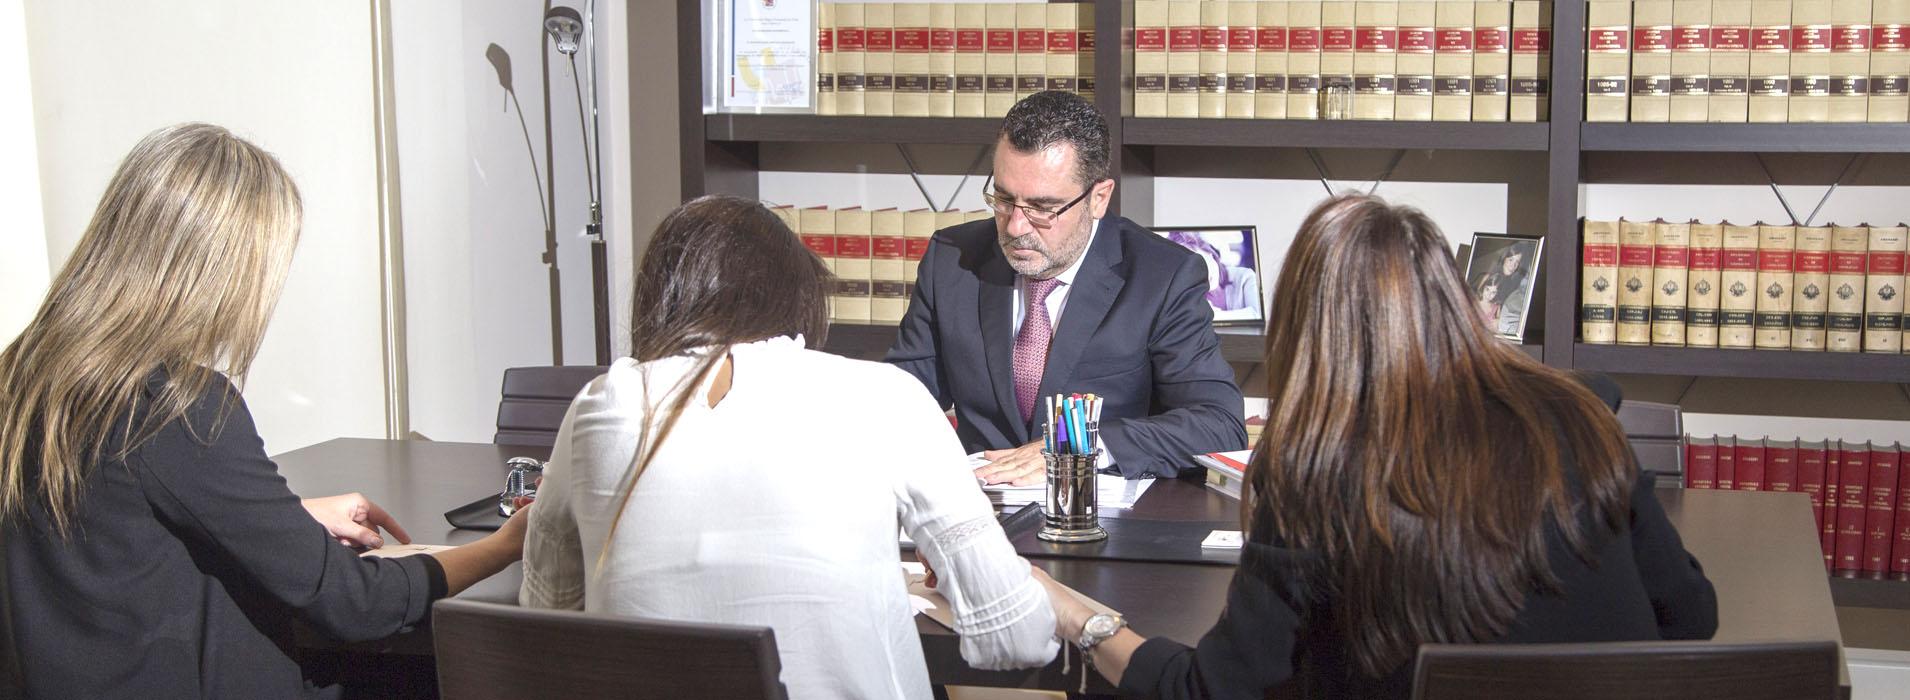 jimenez-abogados-firma3